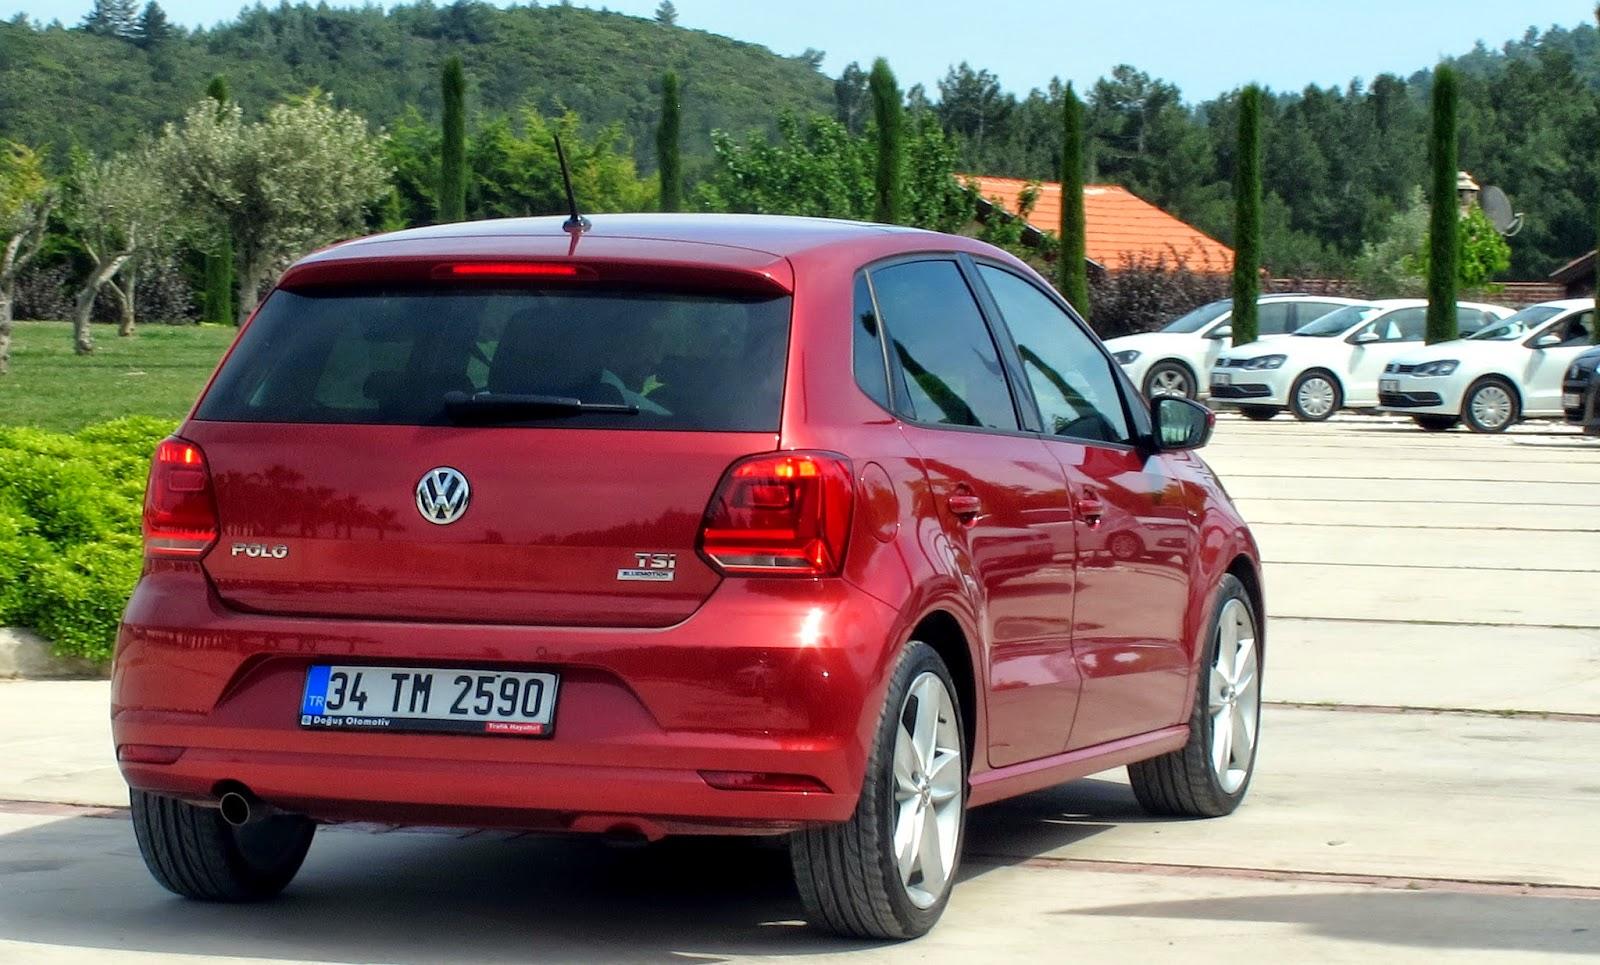 [Resim: Yeni_VW_Polo+(14).jpg]